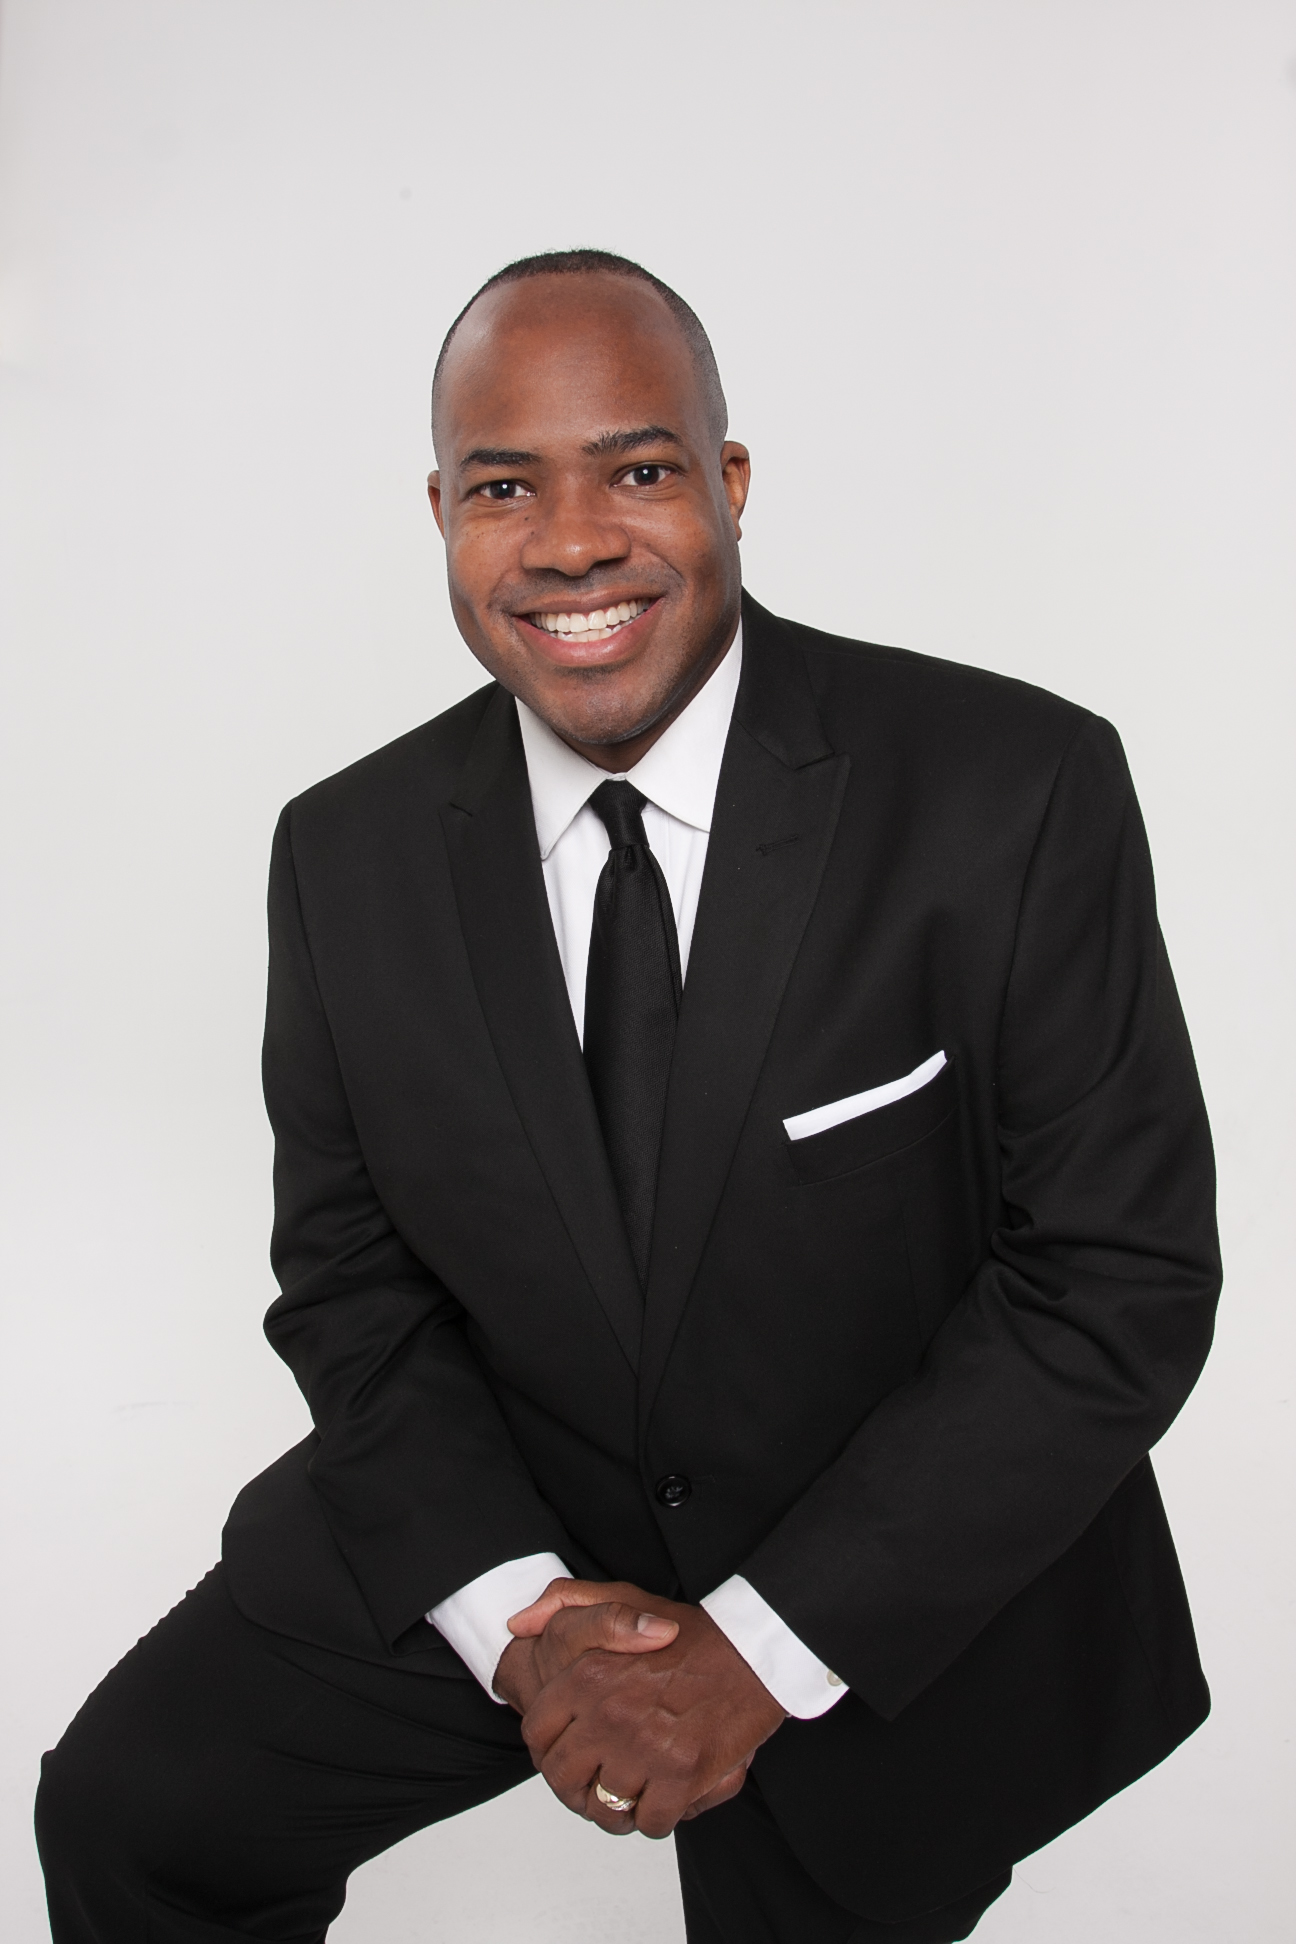 Christopher J. Harris